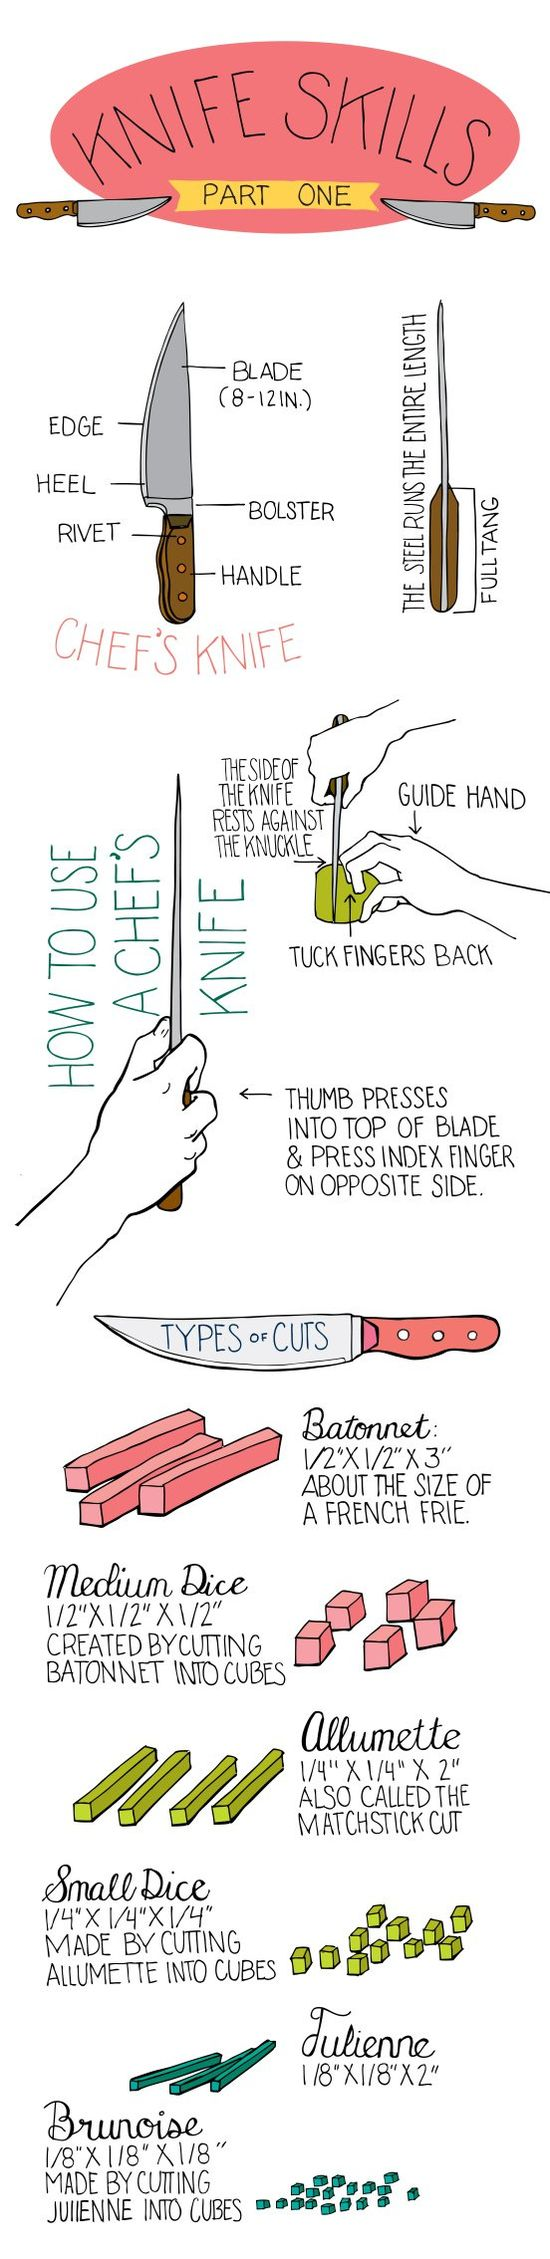 Knife skills #Knife #Skills #Kitchen #Cooking #Infographics #Food